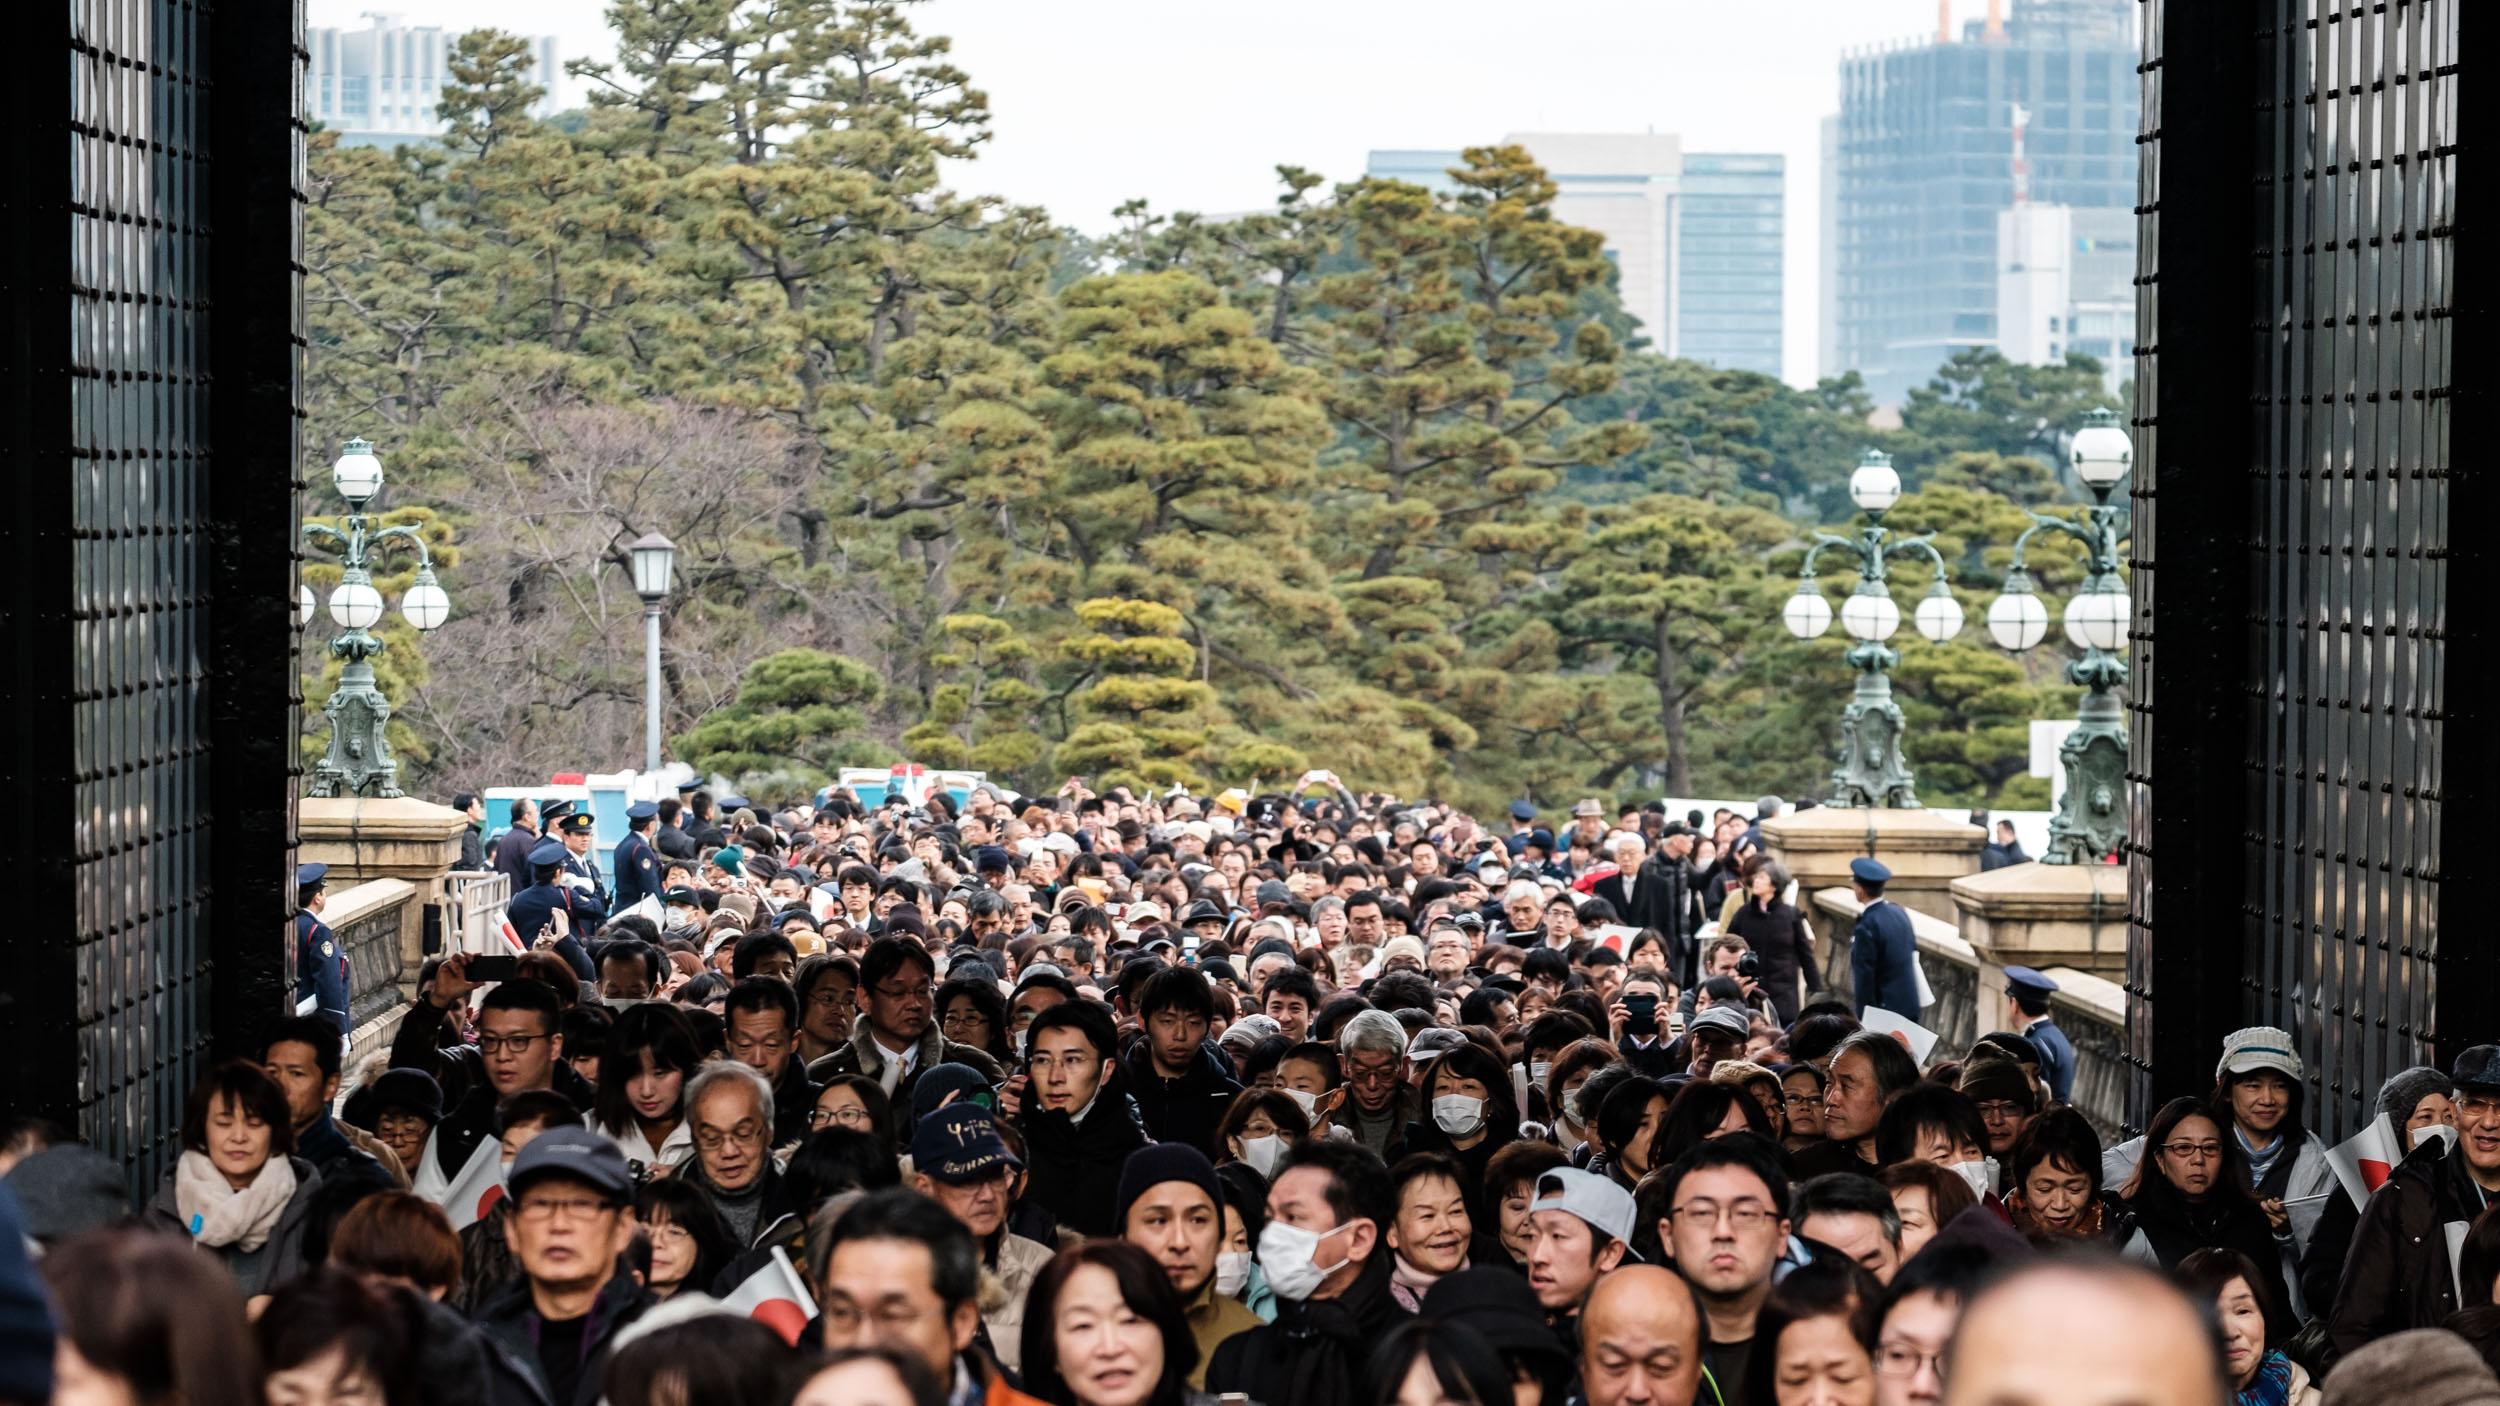 The crowd entering through Main Gate.